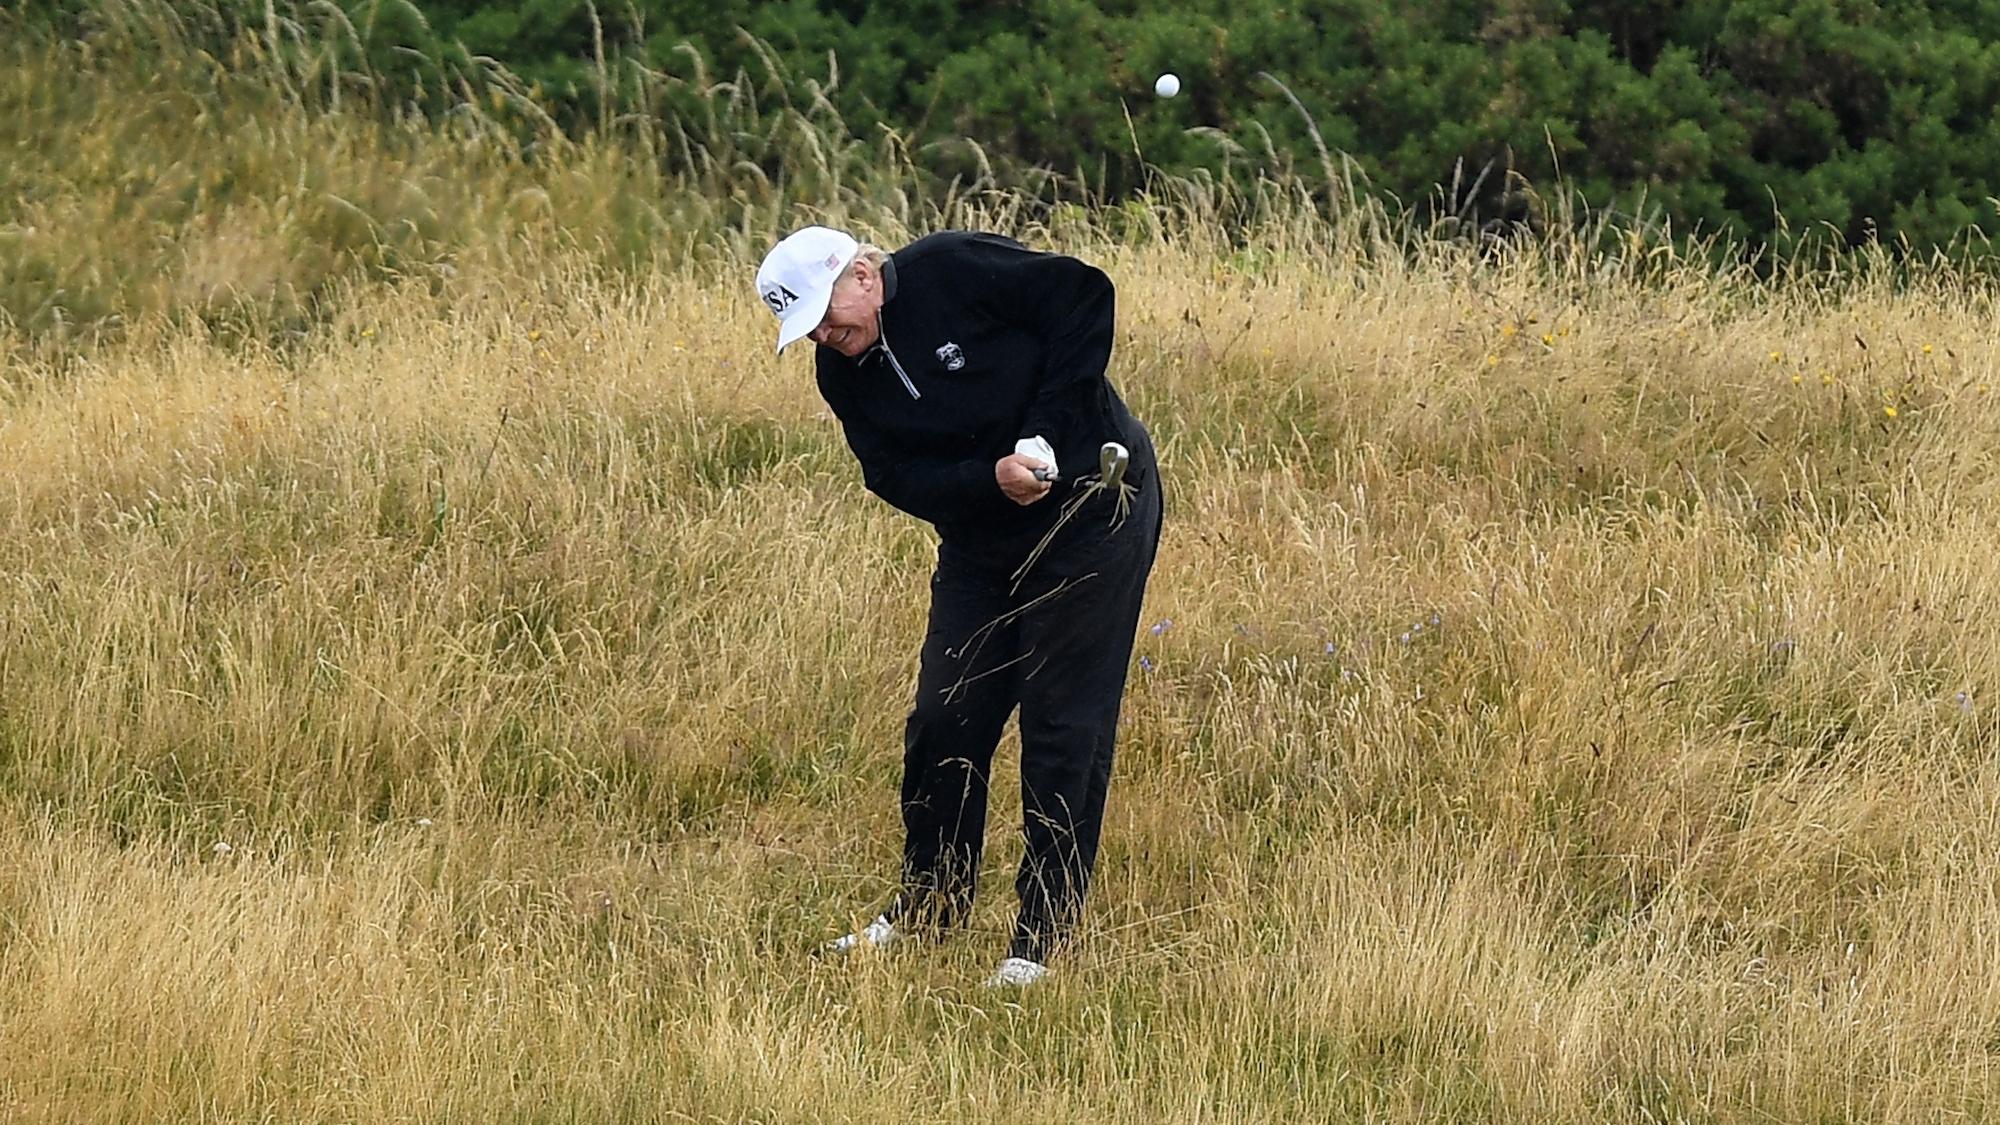 Donald Trump golf score: President posts 68 on handicap site